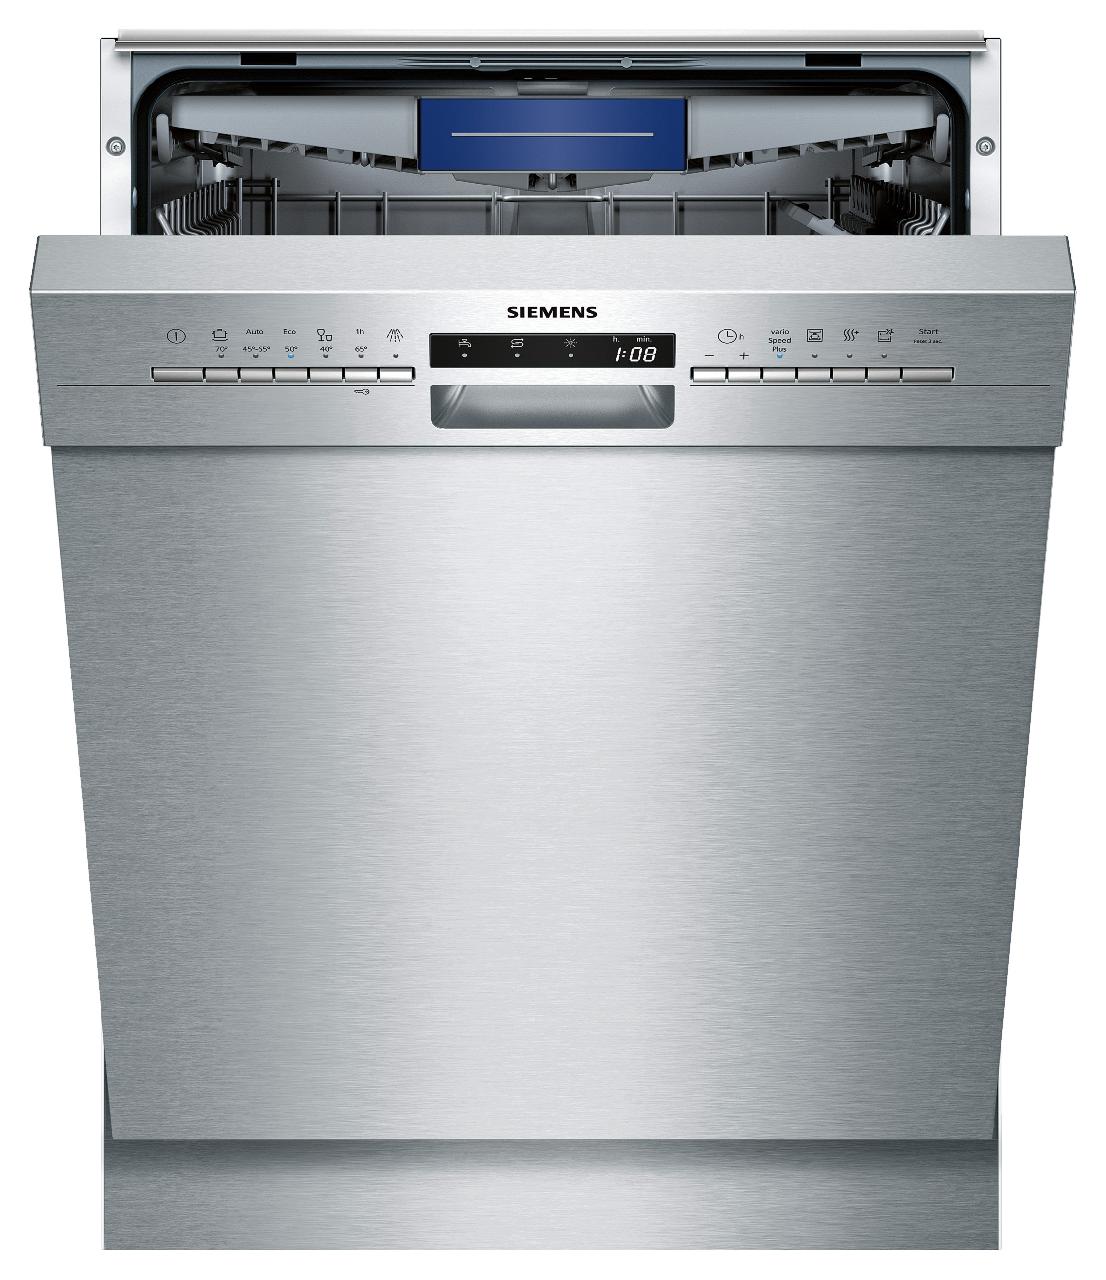 Wunderbar Siemens Geschirrspüler Unterbaugerät Edelstahl SN436S01KE EEK: A++